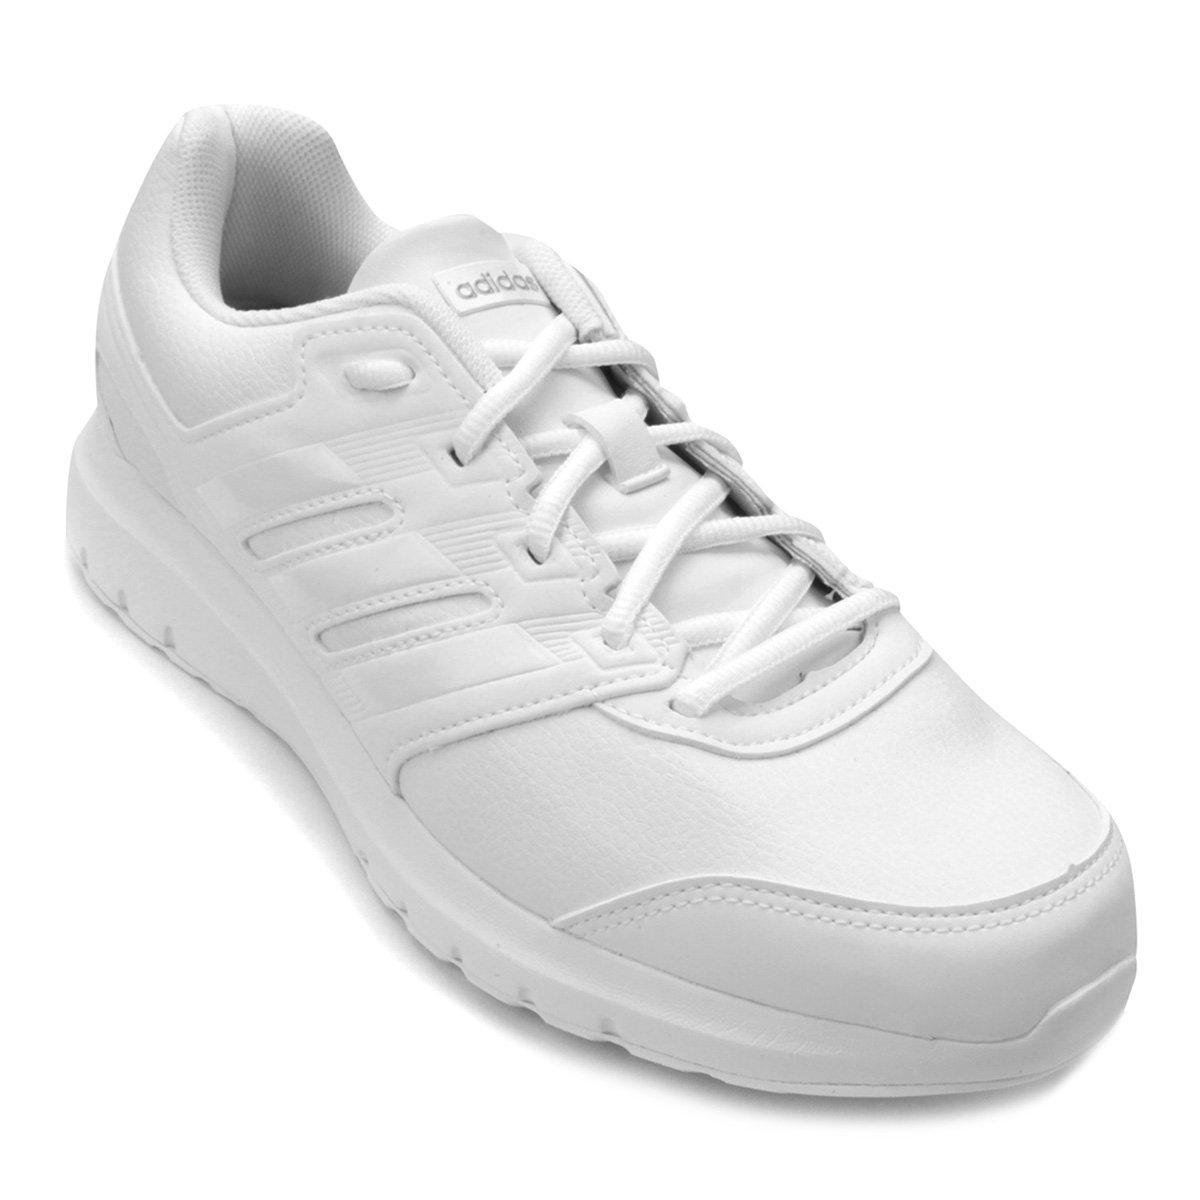 buy online 5673e d2239 Tênis Adidas Duramo Lite 2.0 Ck8647